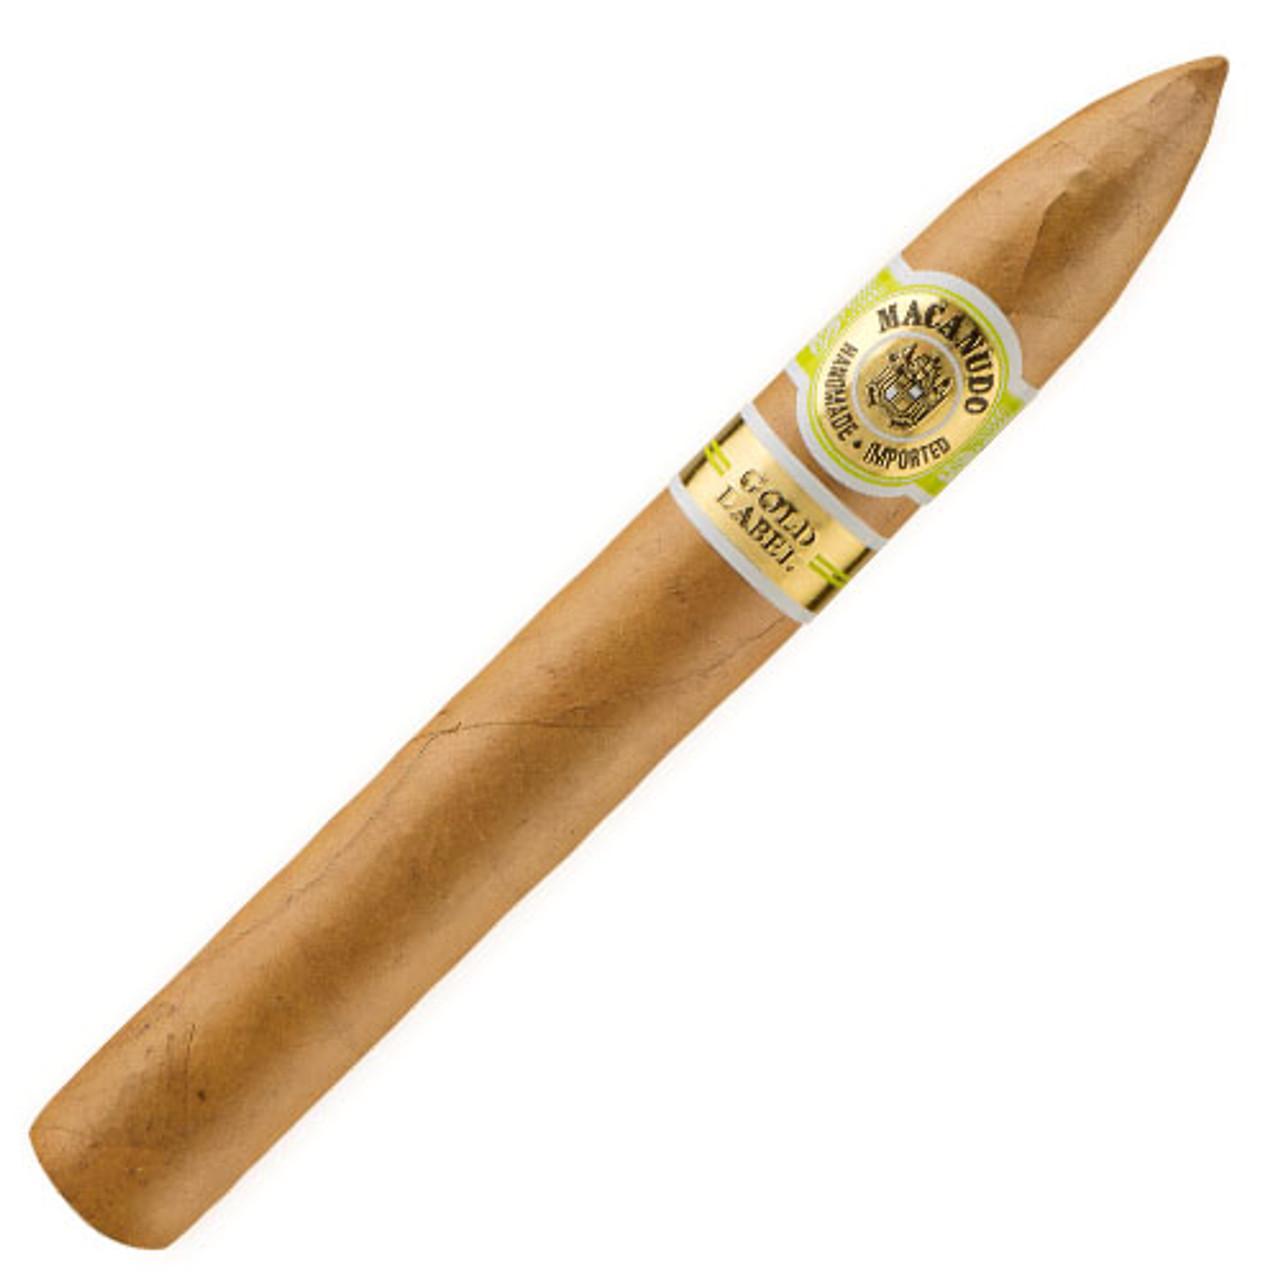 Macanudo Gold Label Gold Torpedo Cigars - 6.5 x 52 (Box of 21)